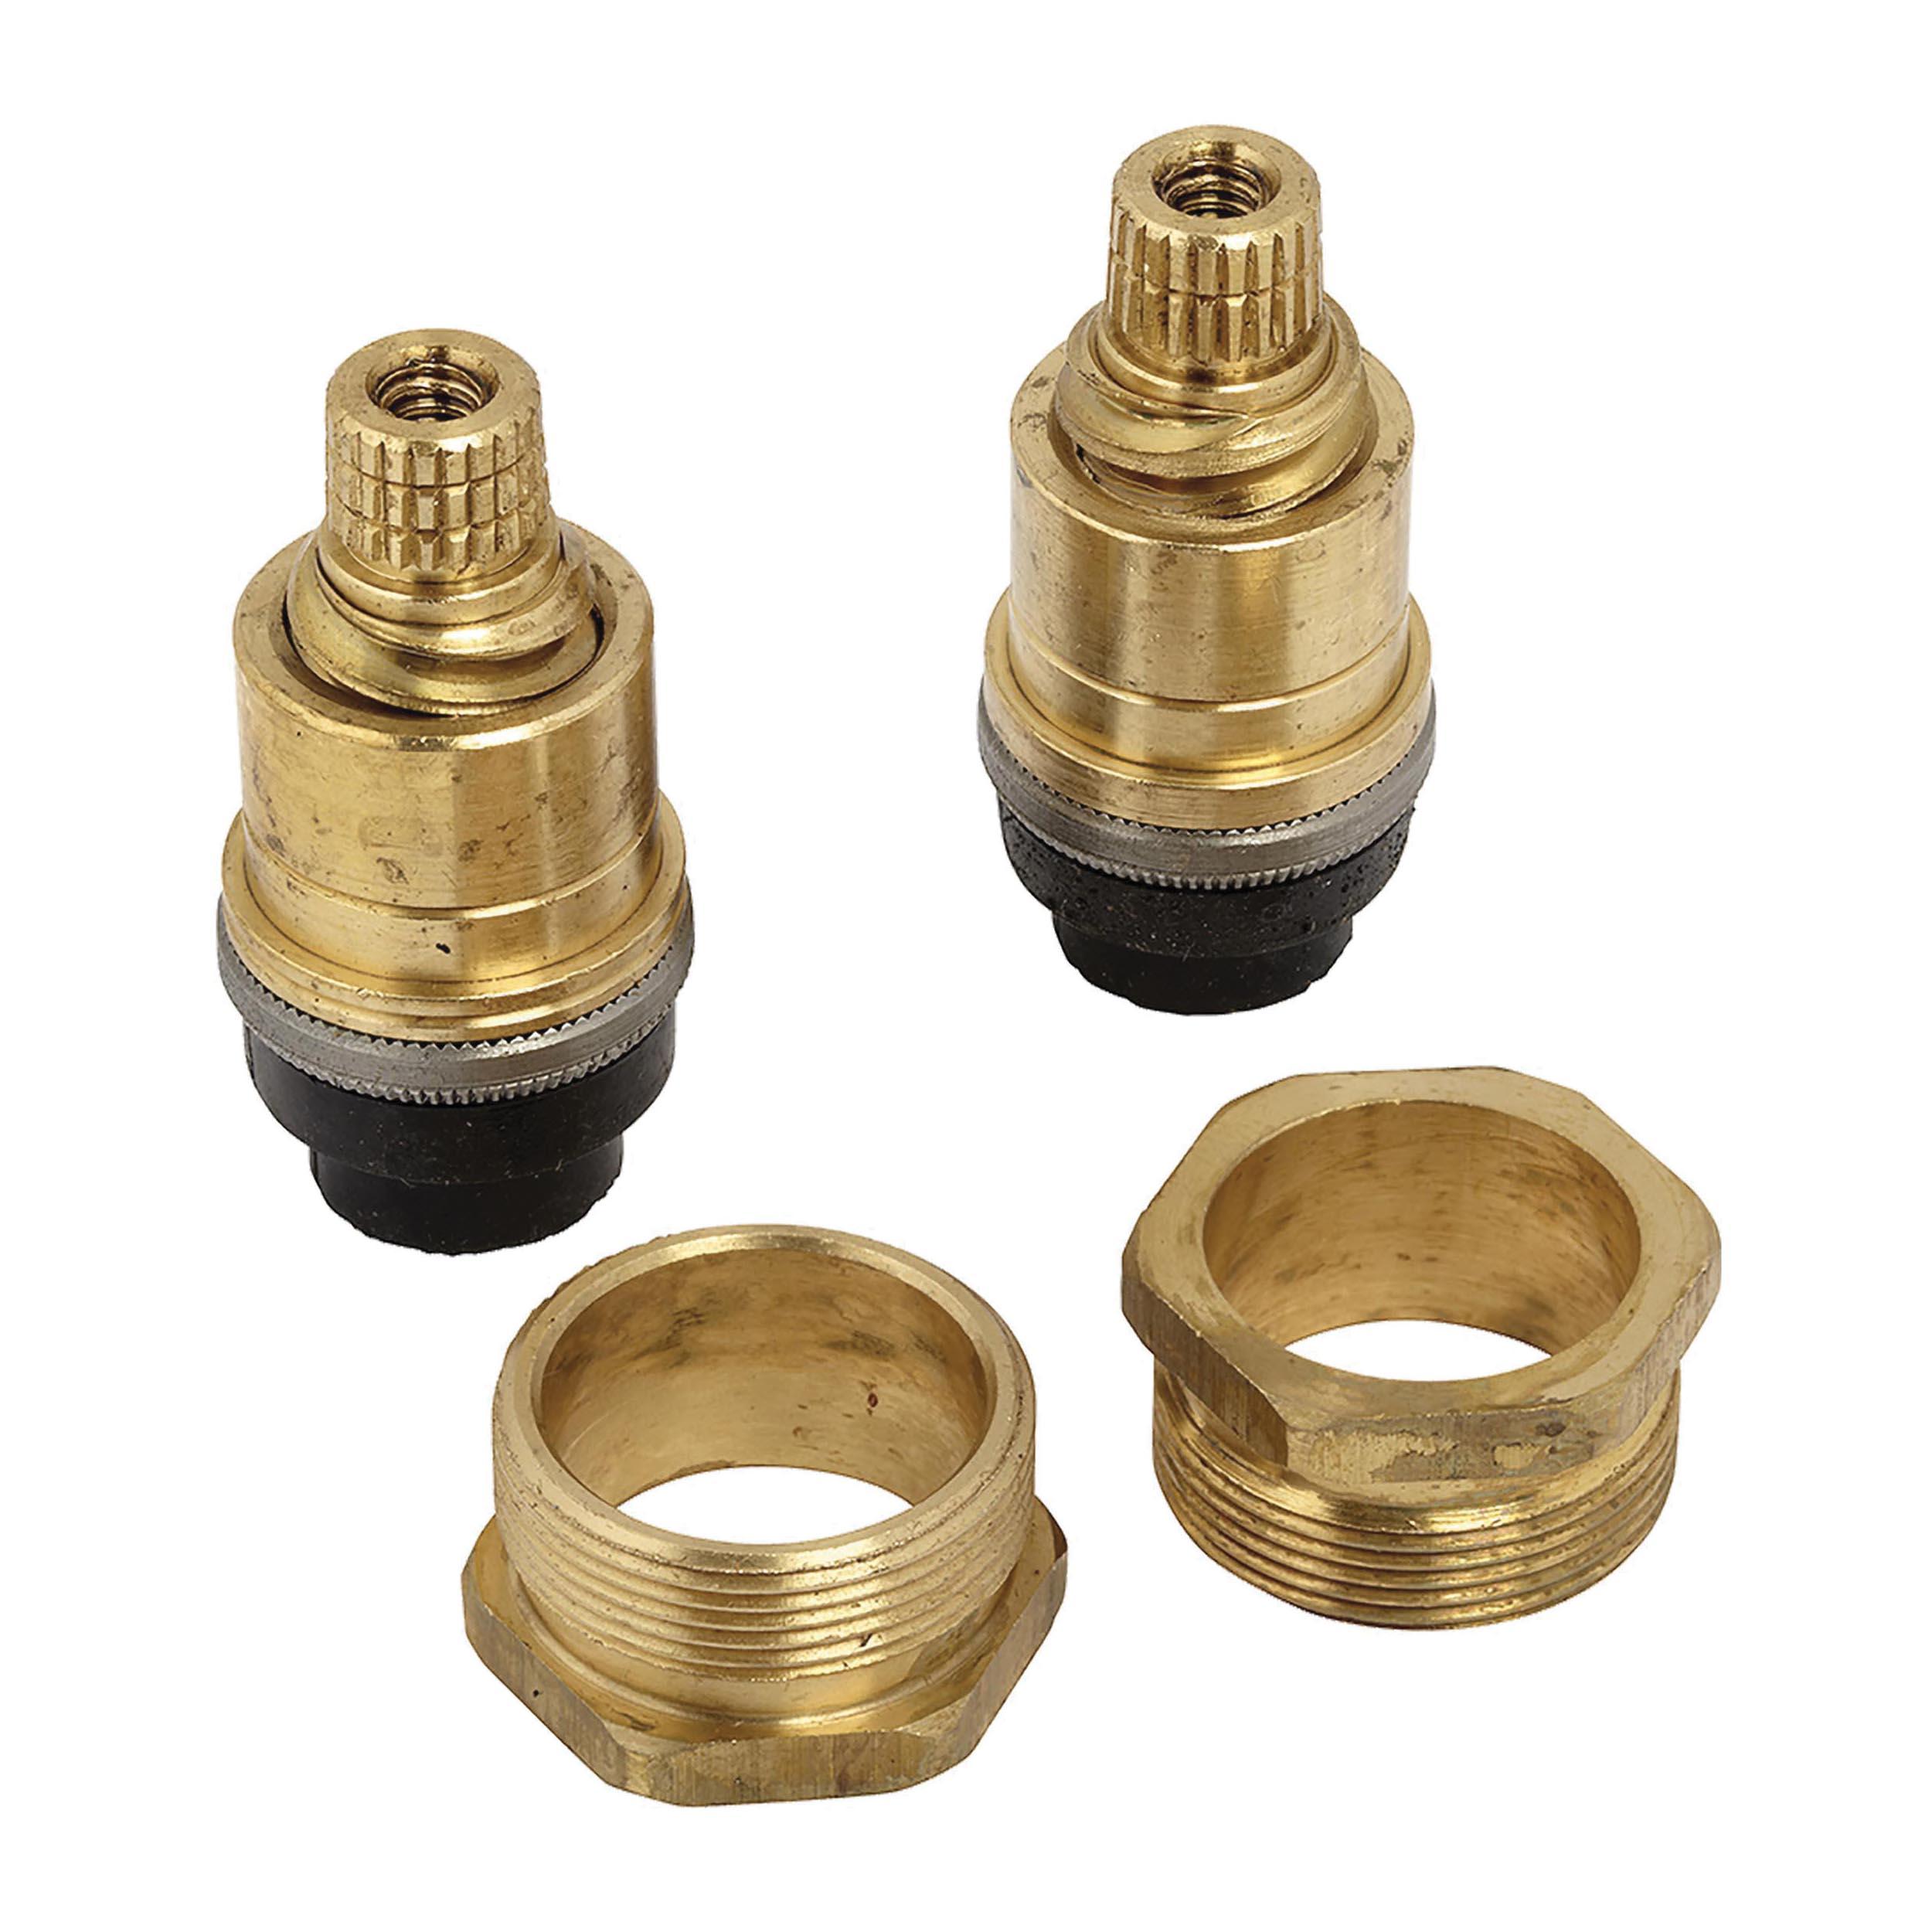 American Standard 066291-0070A Aqua Seal® Left/Right Hand Valve Rebuild Kit, Brass, Domestic